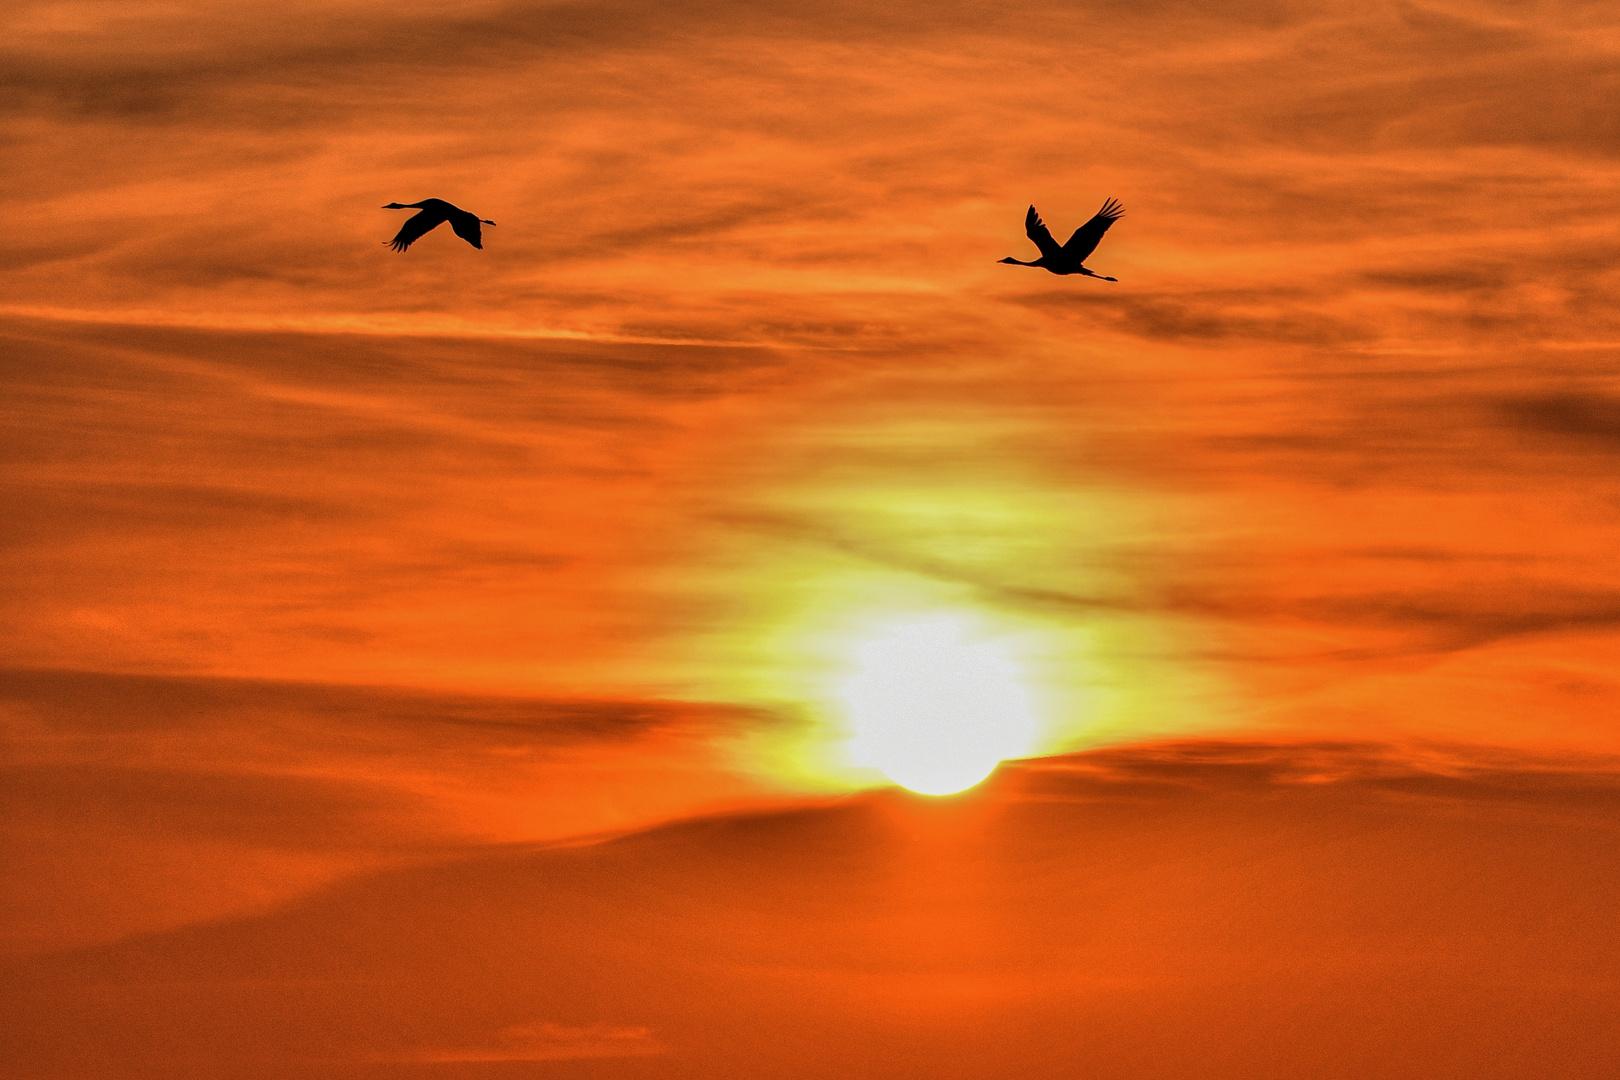 Zum Sonnenaufgang am See